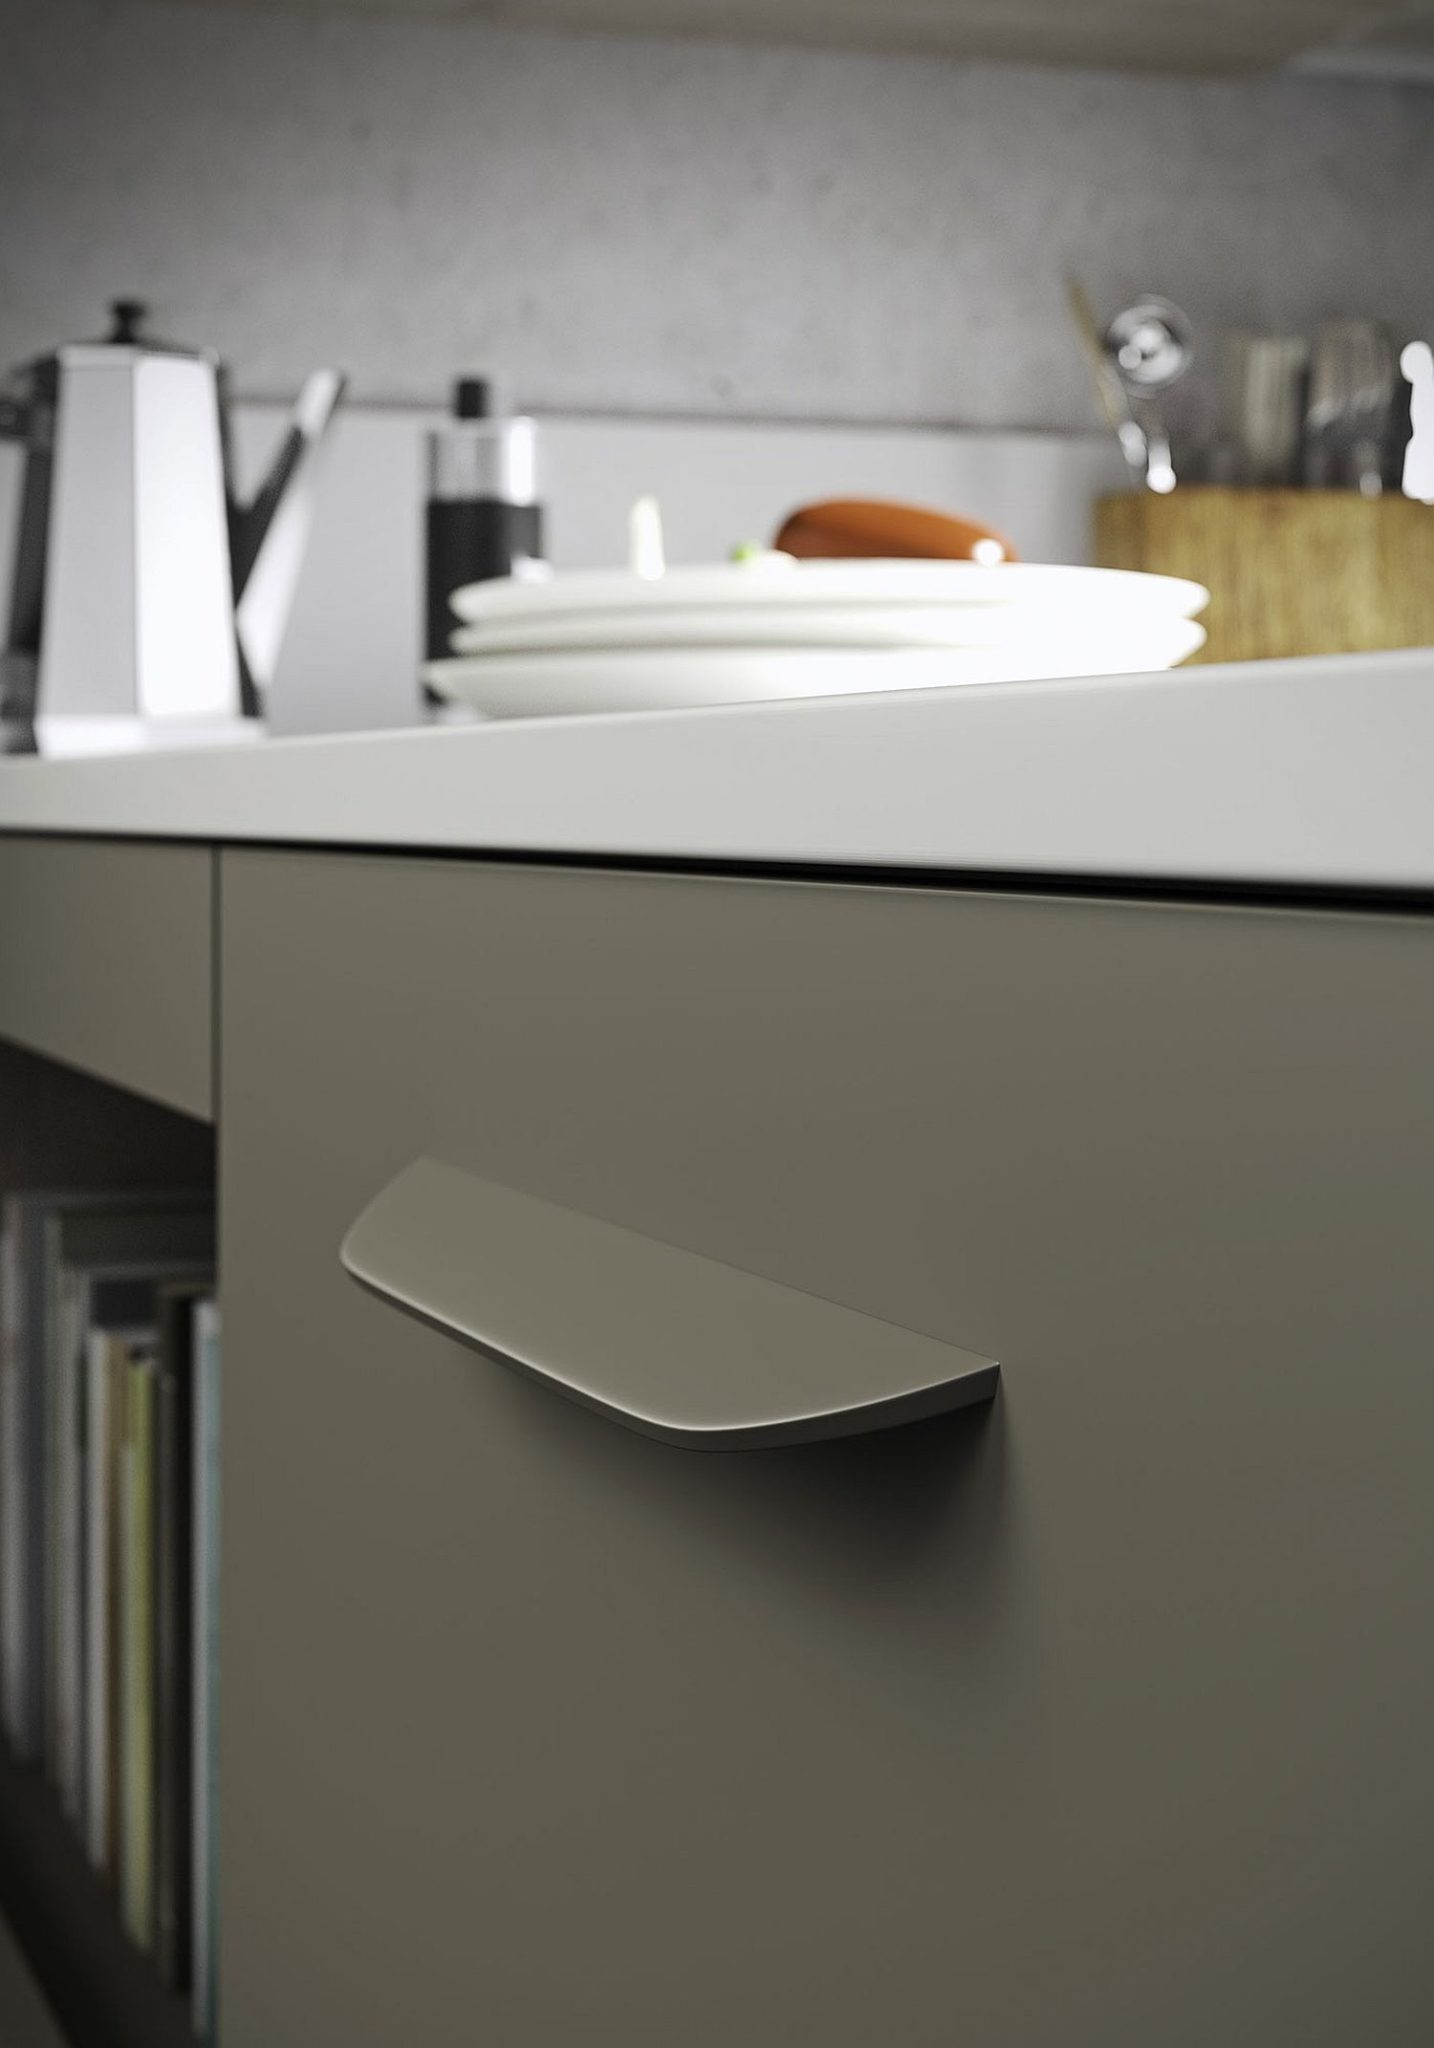 Unique-handle-design-of-the-Fun-kitchen-cabinets